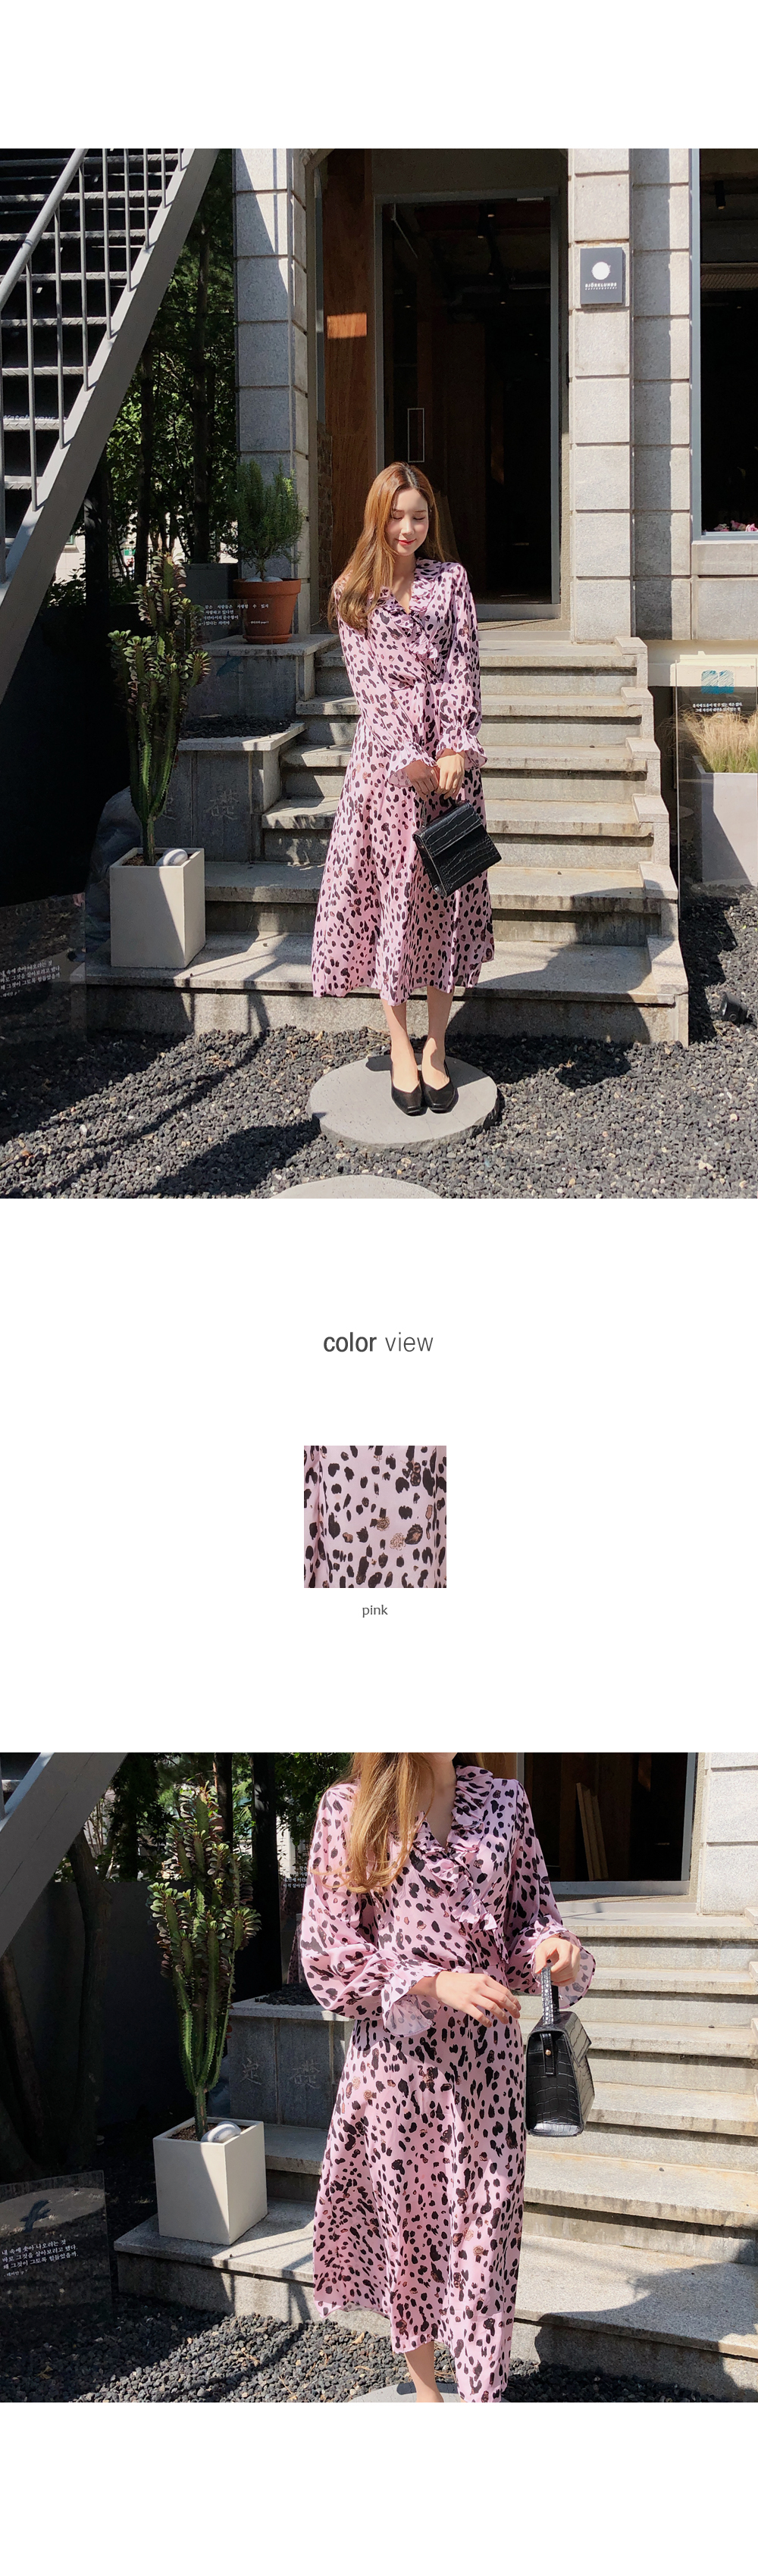 Charming pink leopard dress